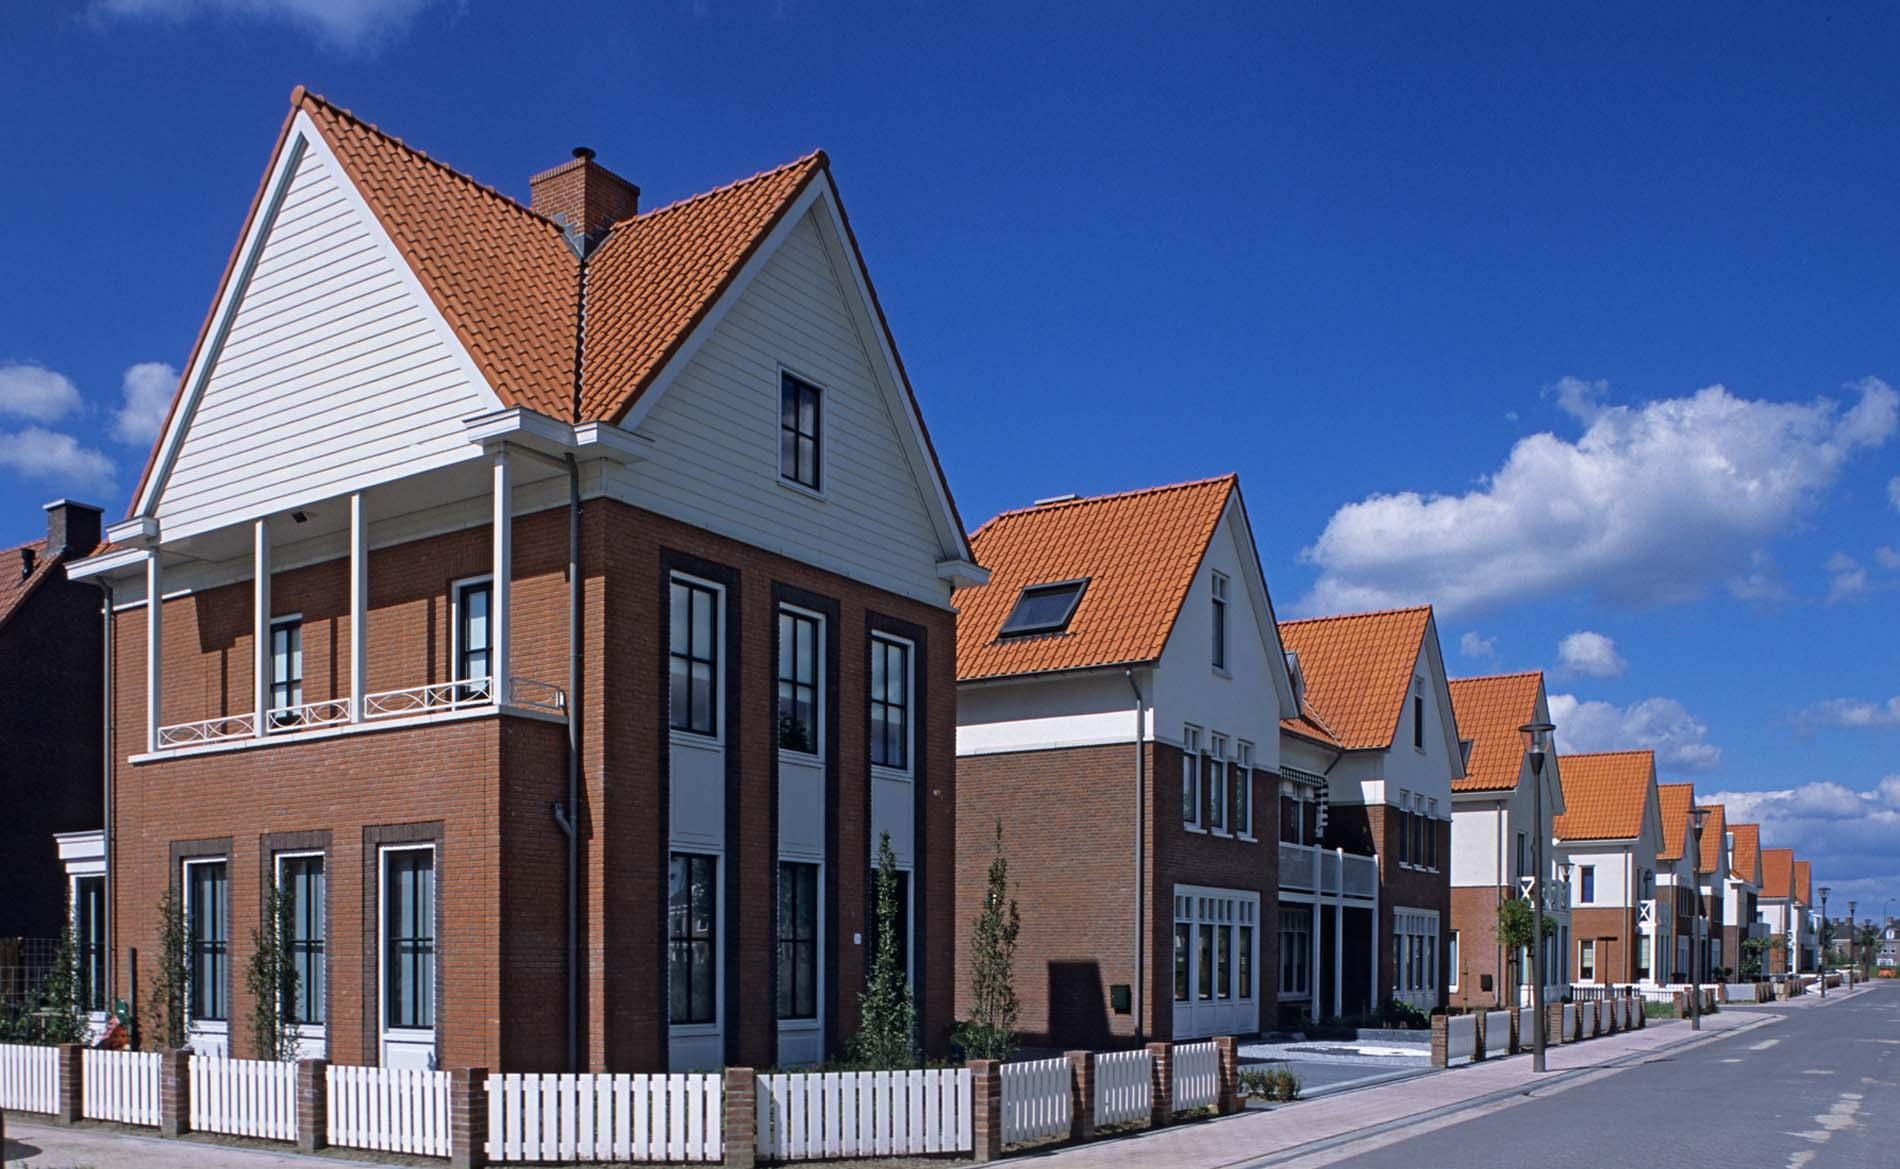 architect woningbouw woningen Brandevoort BBHD architecten chaletstijl